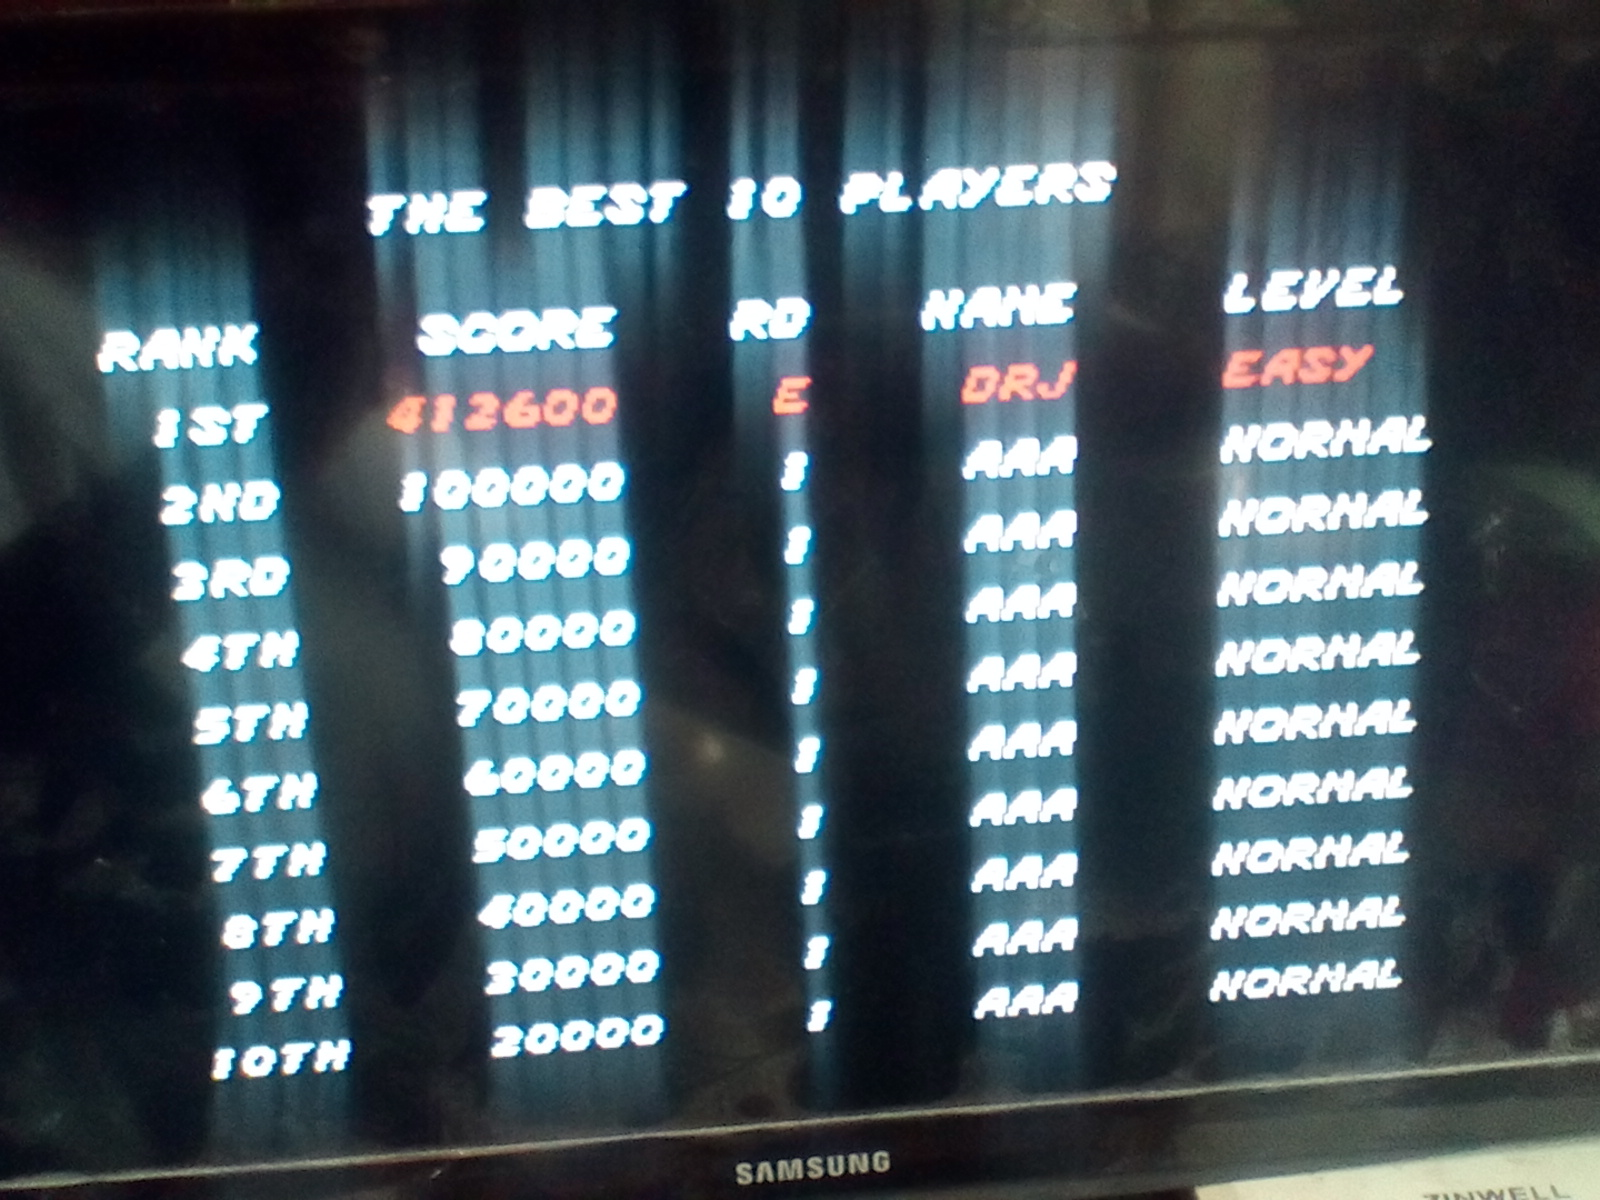 DrJoshDaRealgamer22F: Streets of Rage [Easy] (Sega Genesis / MegaDrive Emulated) 412,600 points on 2018-08-18 13:49:54